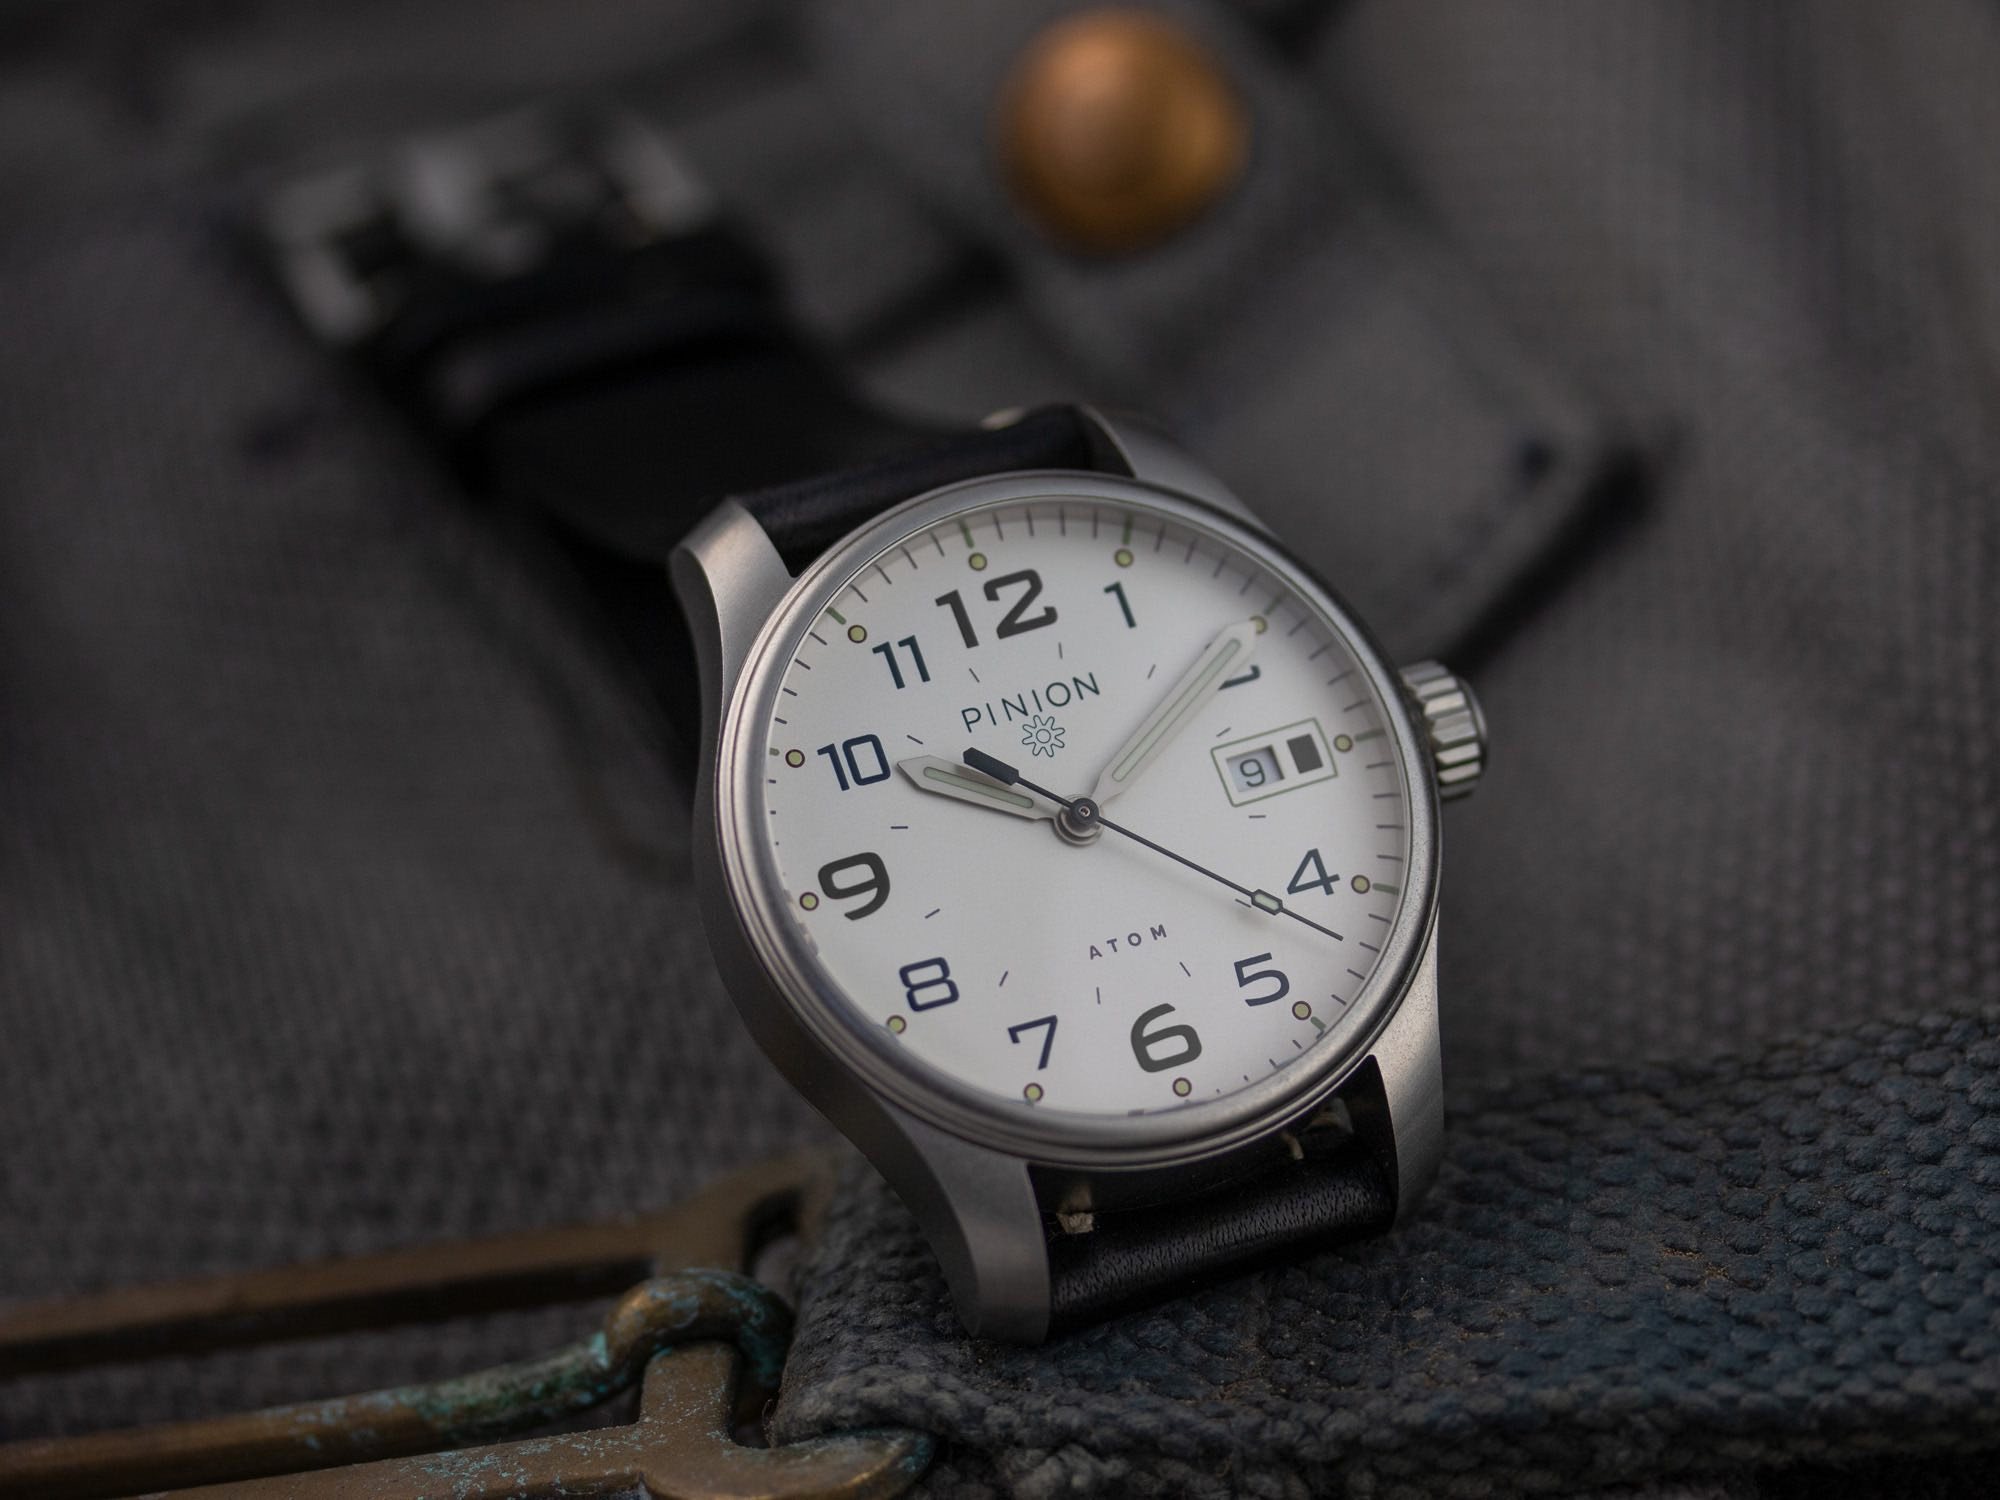 Pinion Atom 39 British tool watch